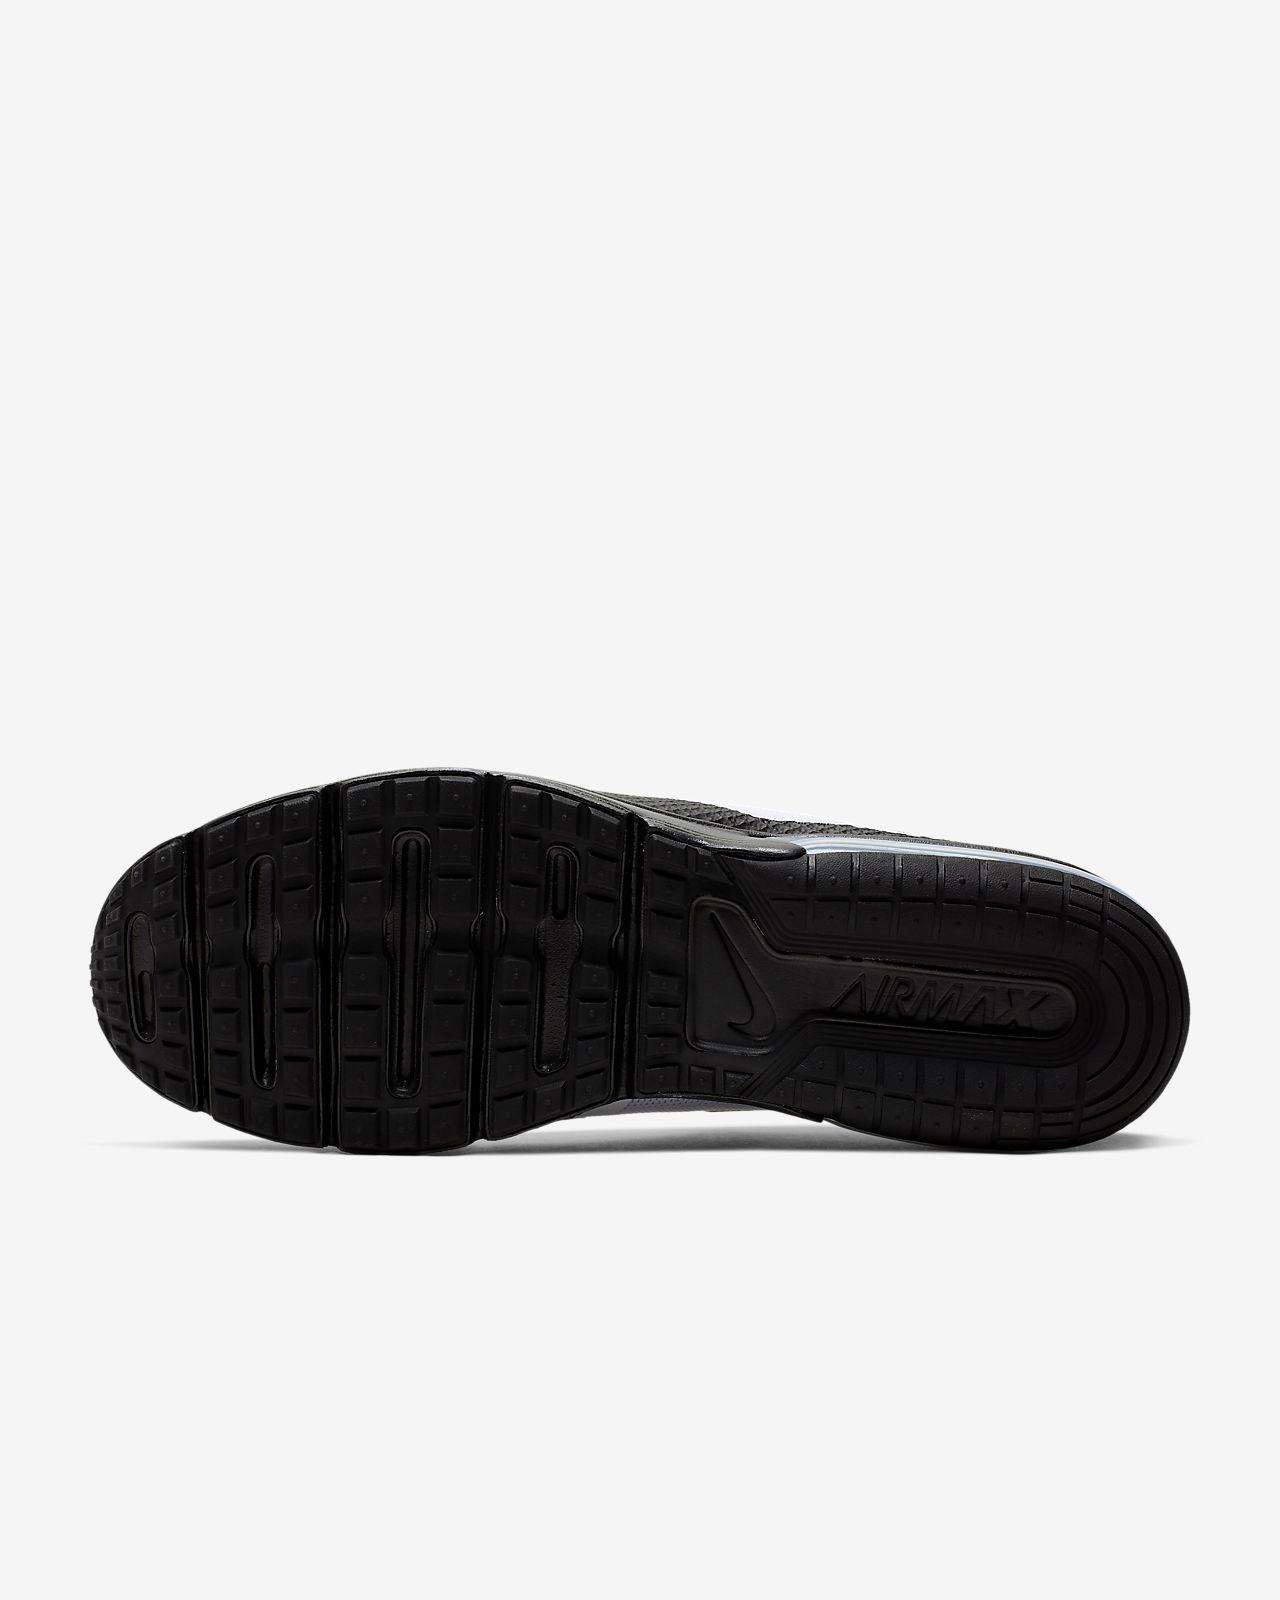 Nike Sportswear Air Max Sequent 4.5 Damen Sneaker weiß